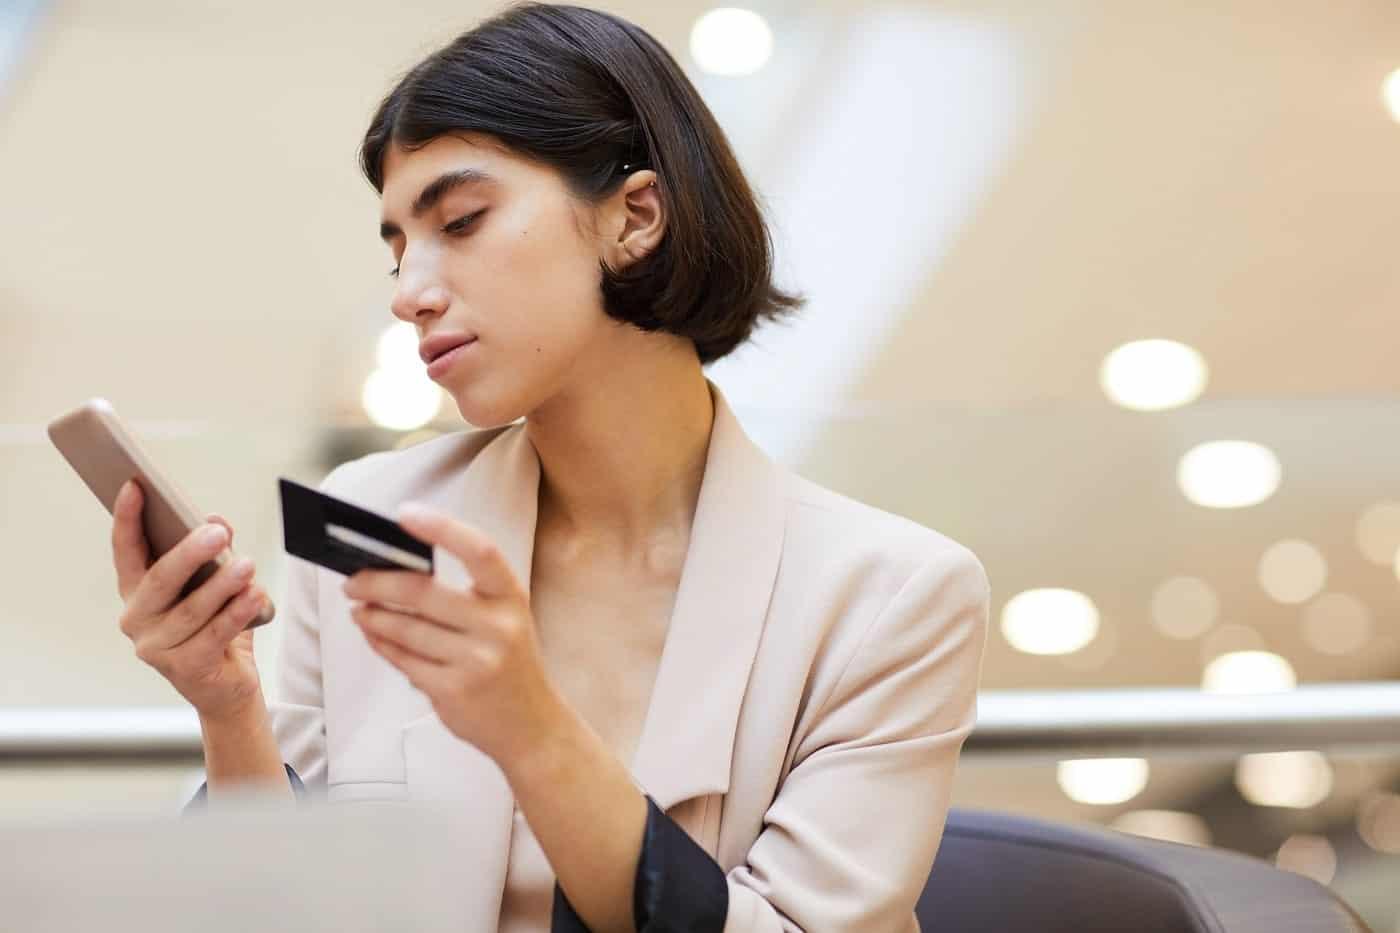 Woman using online bank